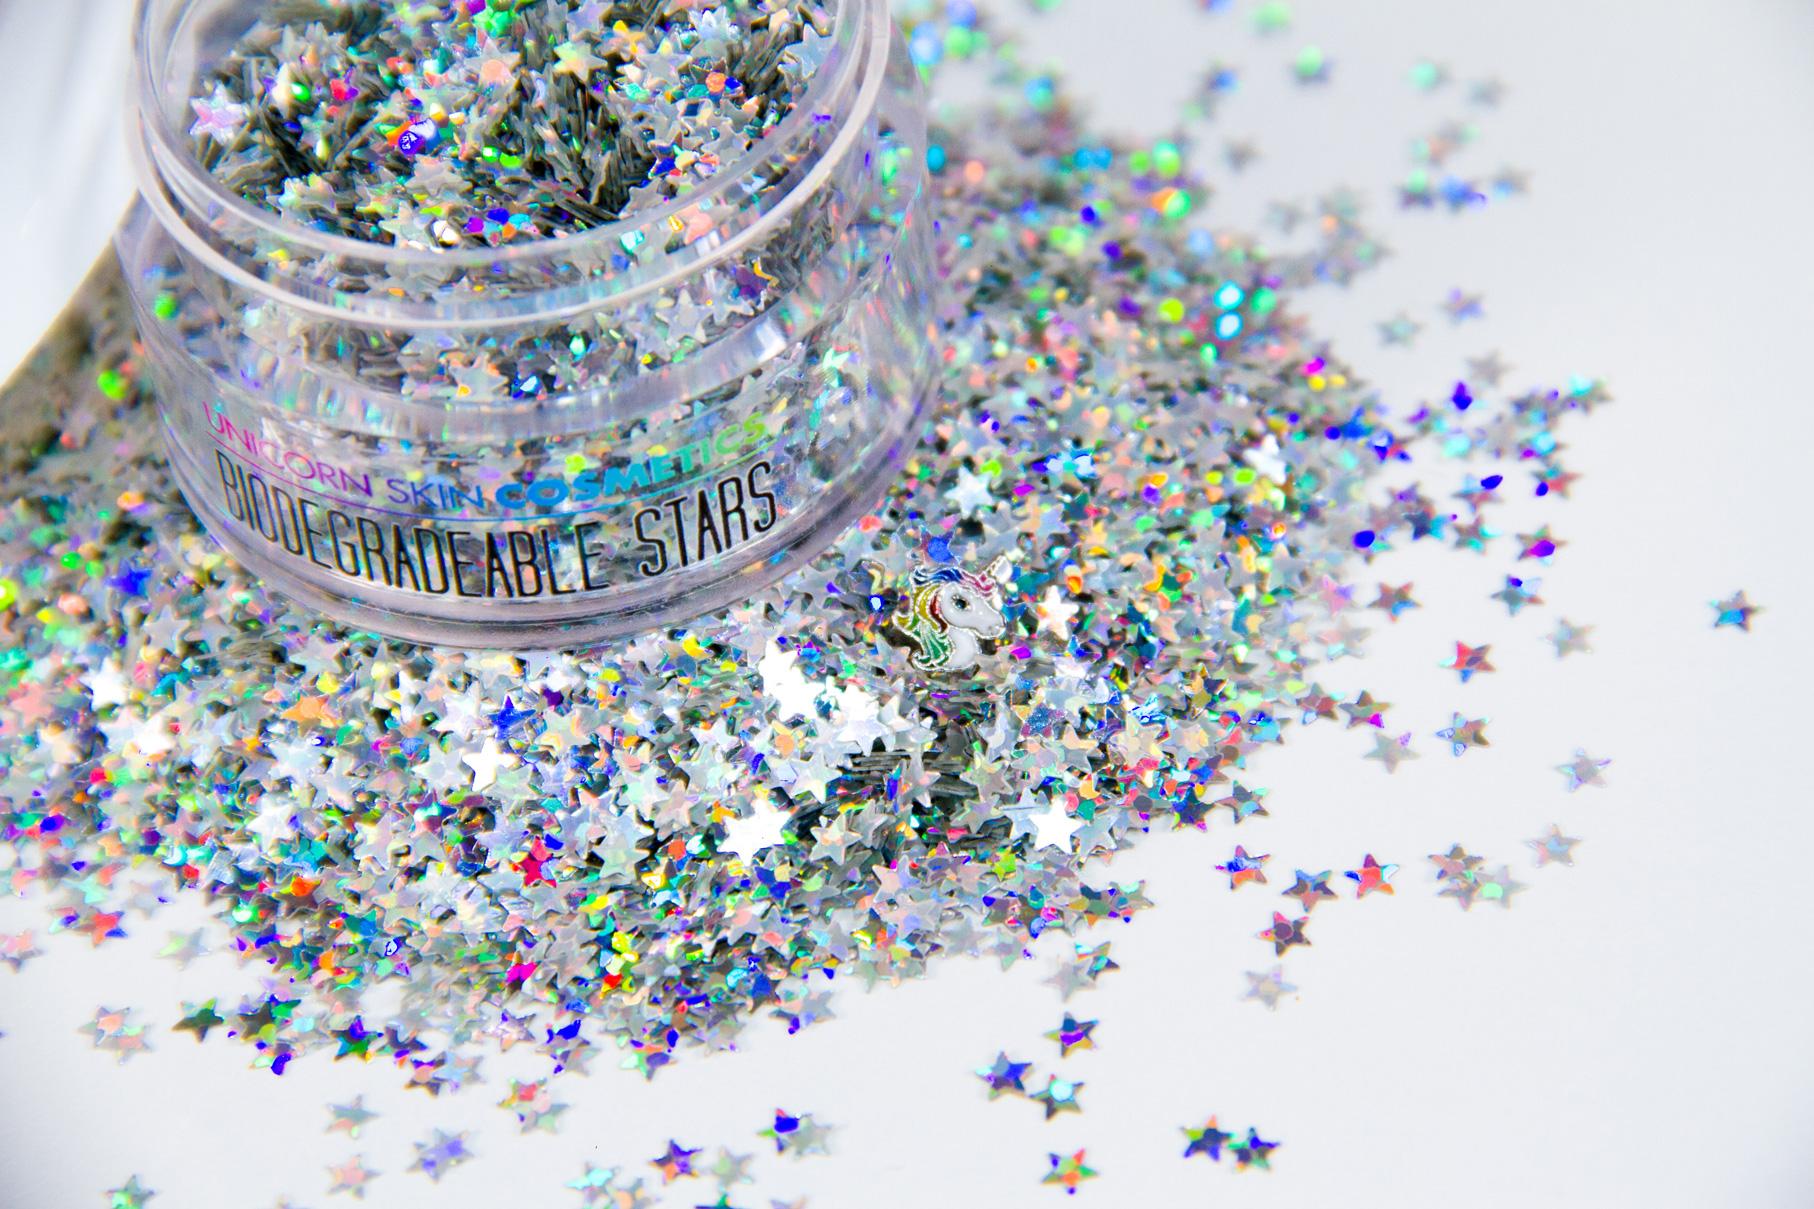 ⭐ Biodegradable STARS! ⭐